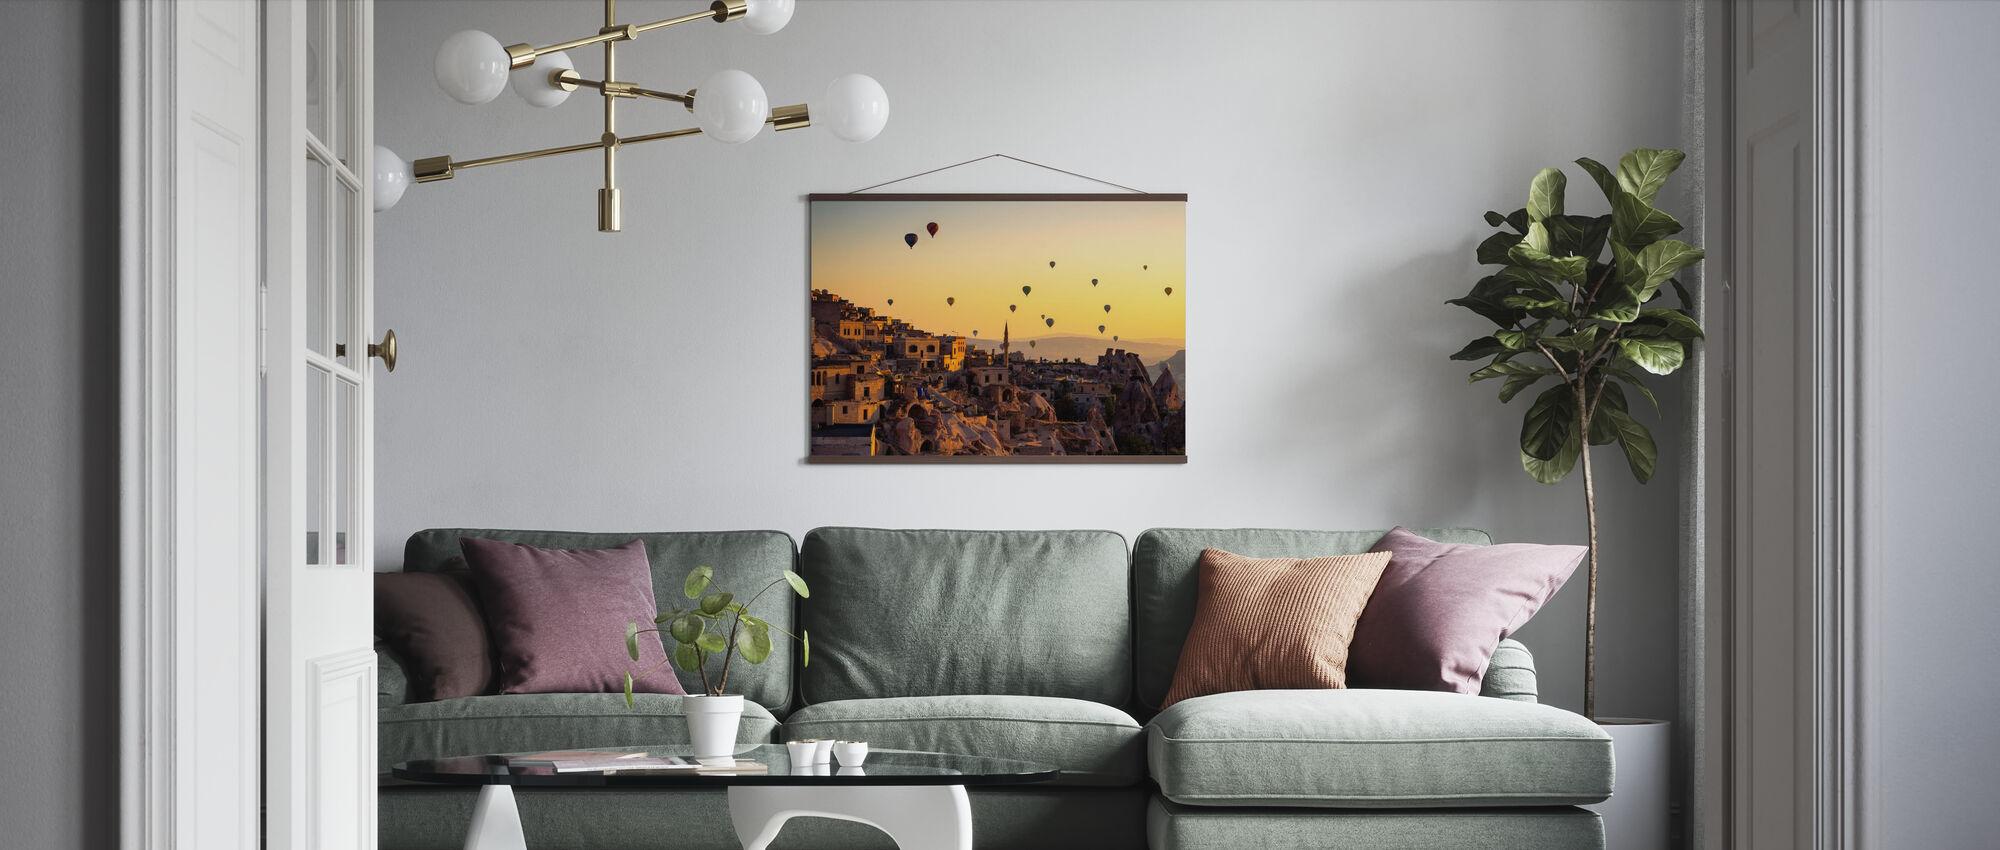 Soloppgang Over Kappadok - Plakat - Stue